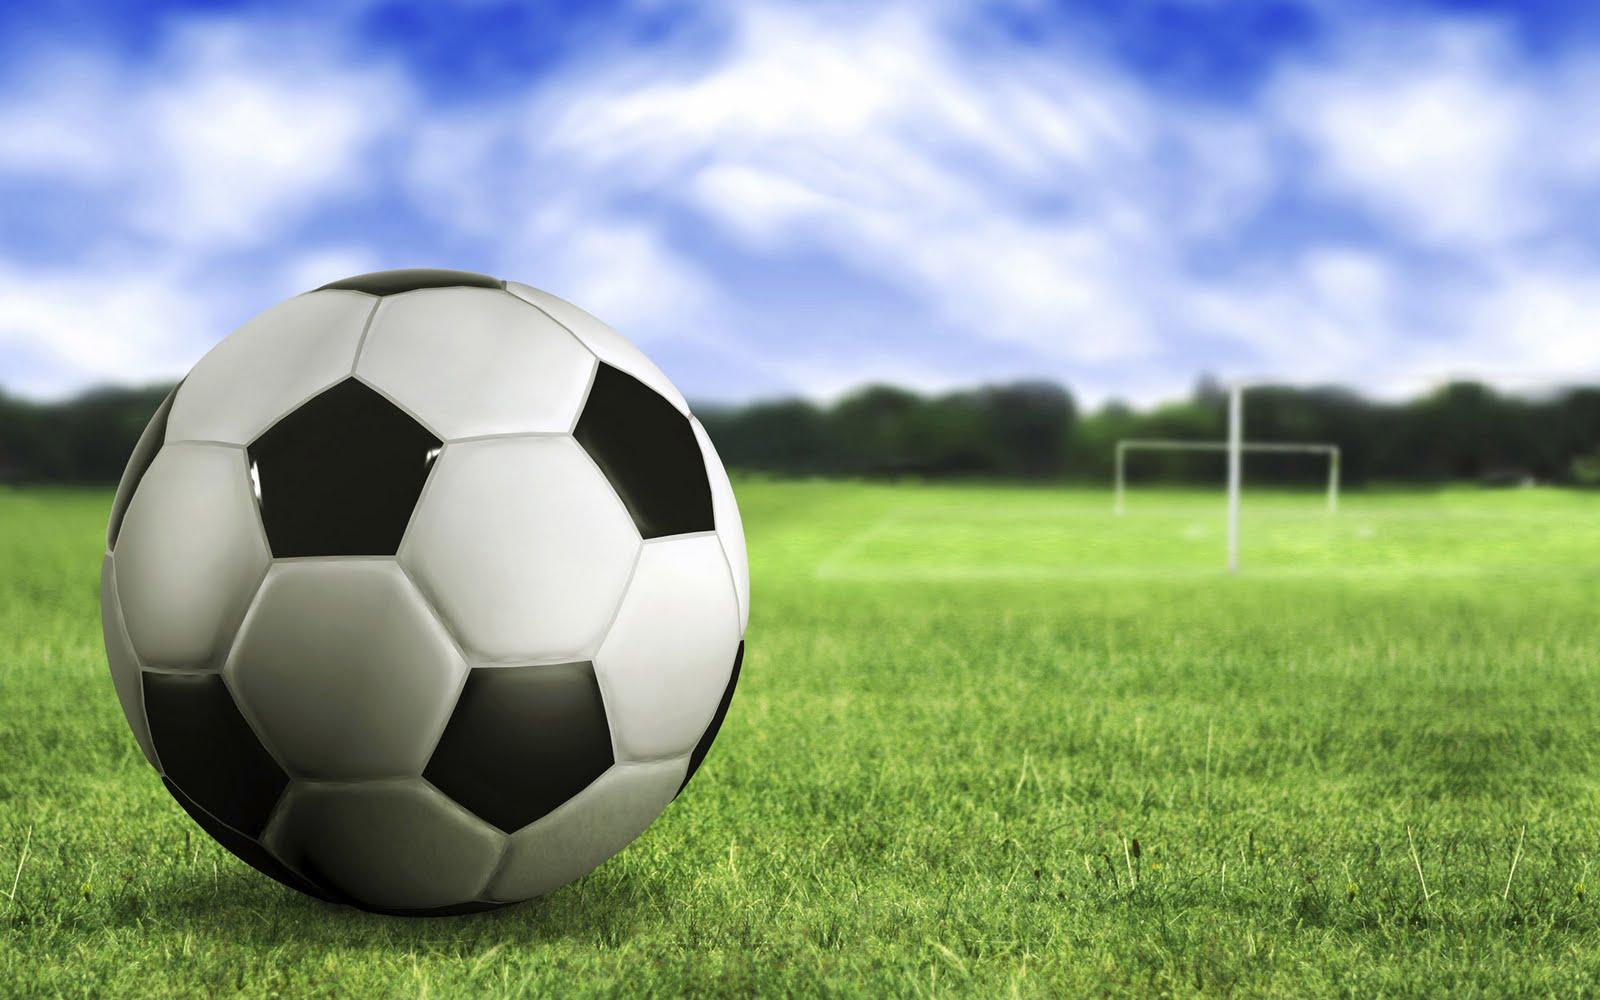 HD Football Soccer Wallpaper best soccer wallpapersfc wallpapers 1600x1000